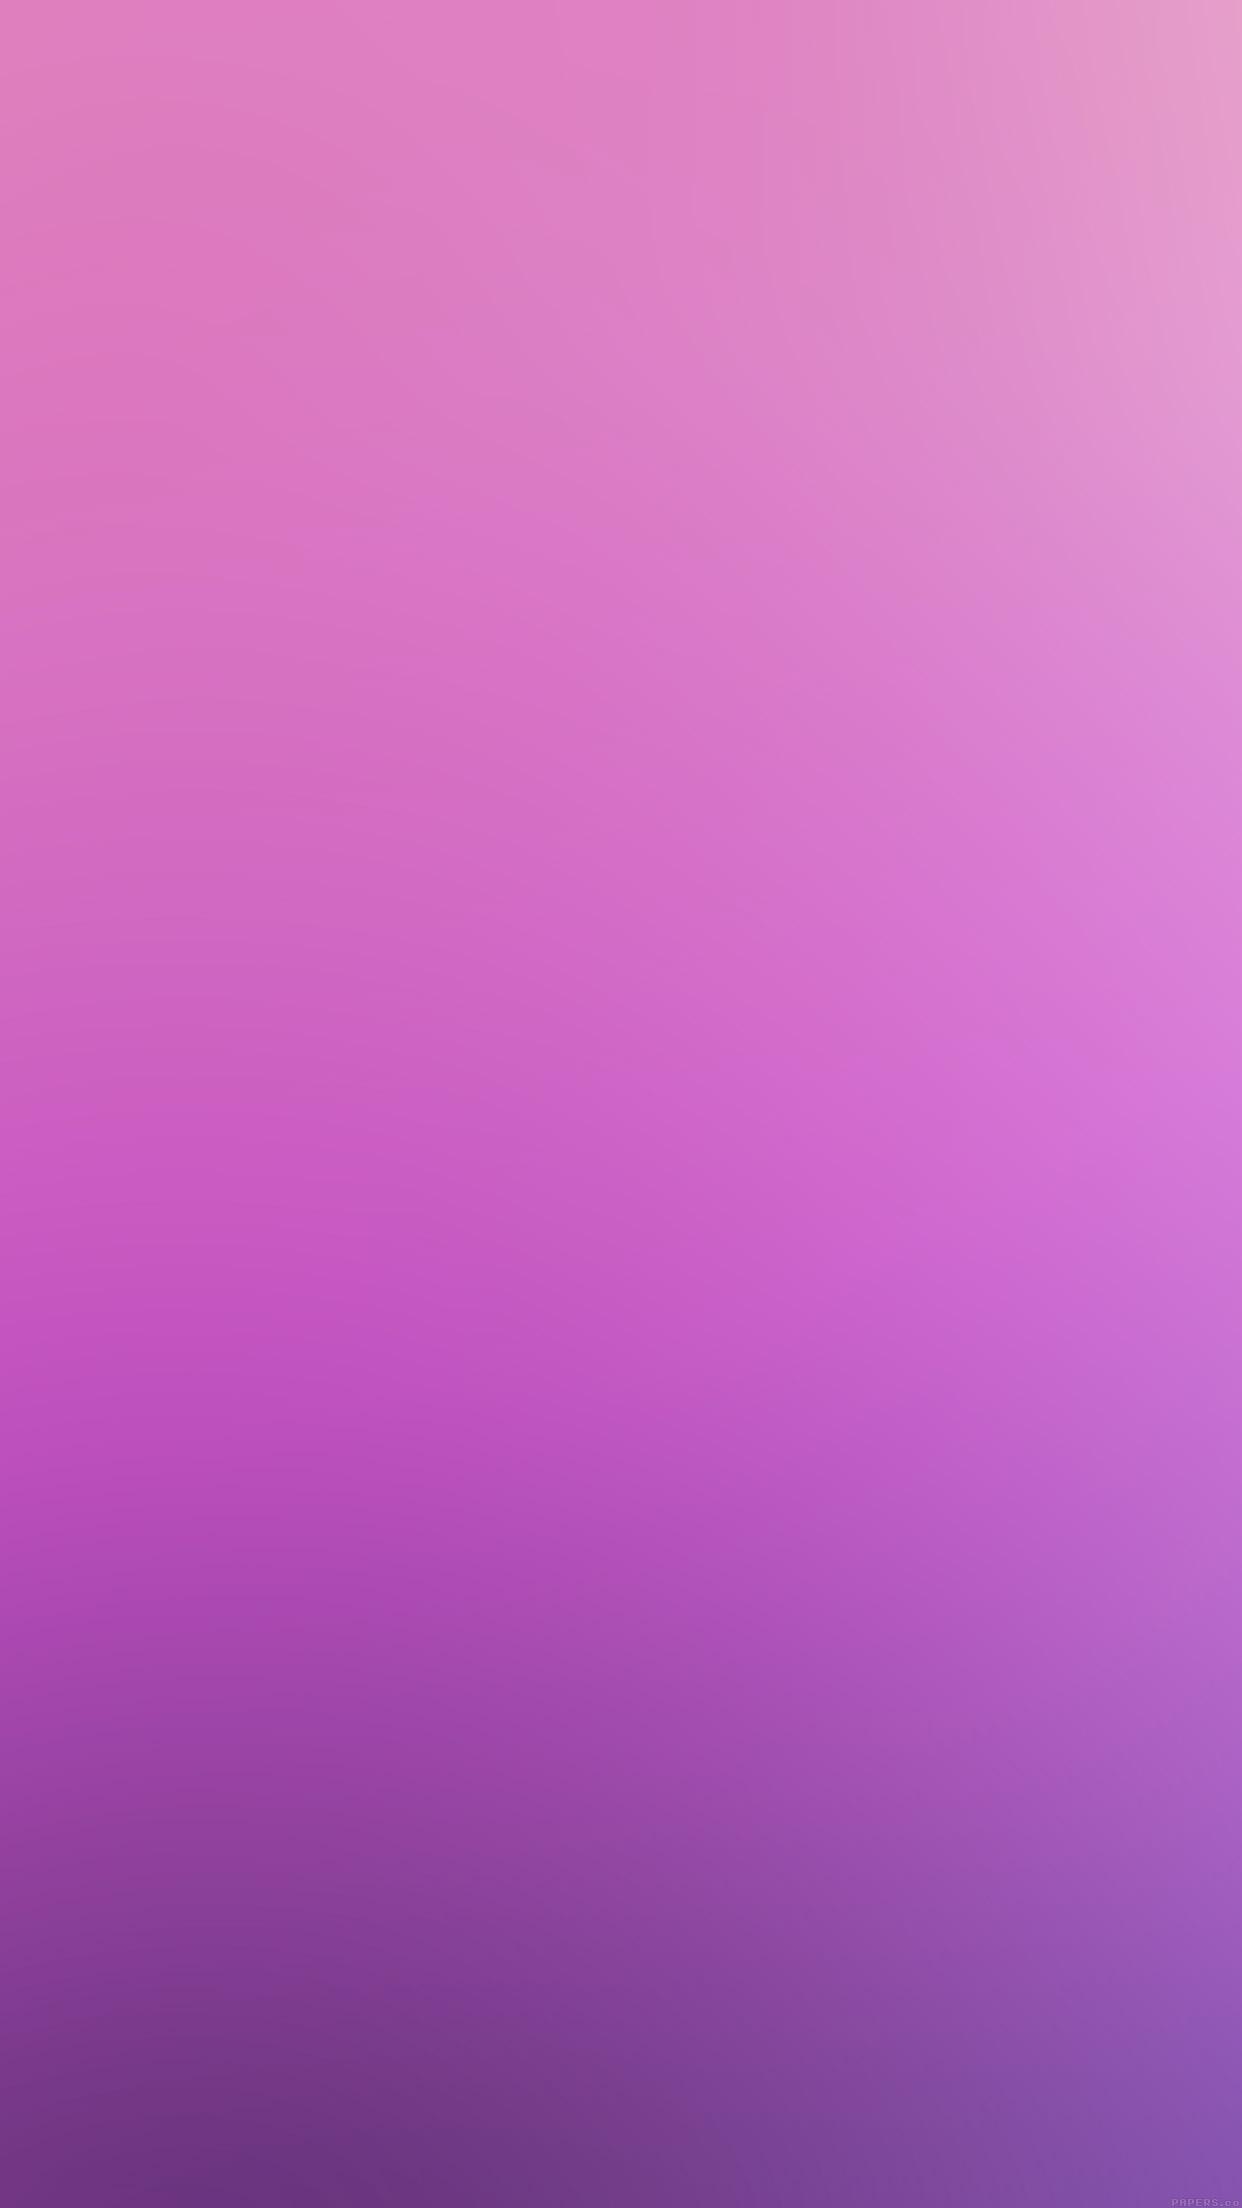 sd93 purple luv gradation blur. Black Bedroom Furniture Sets. Home Design Ideas